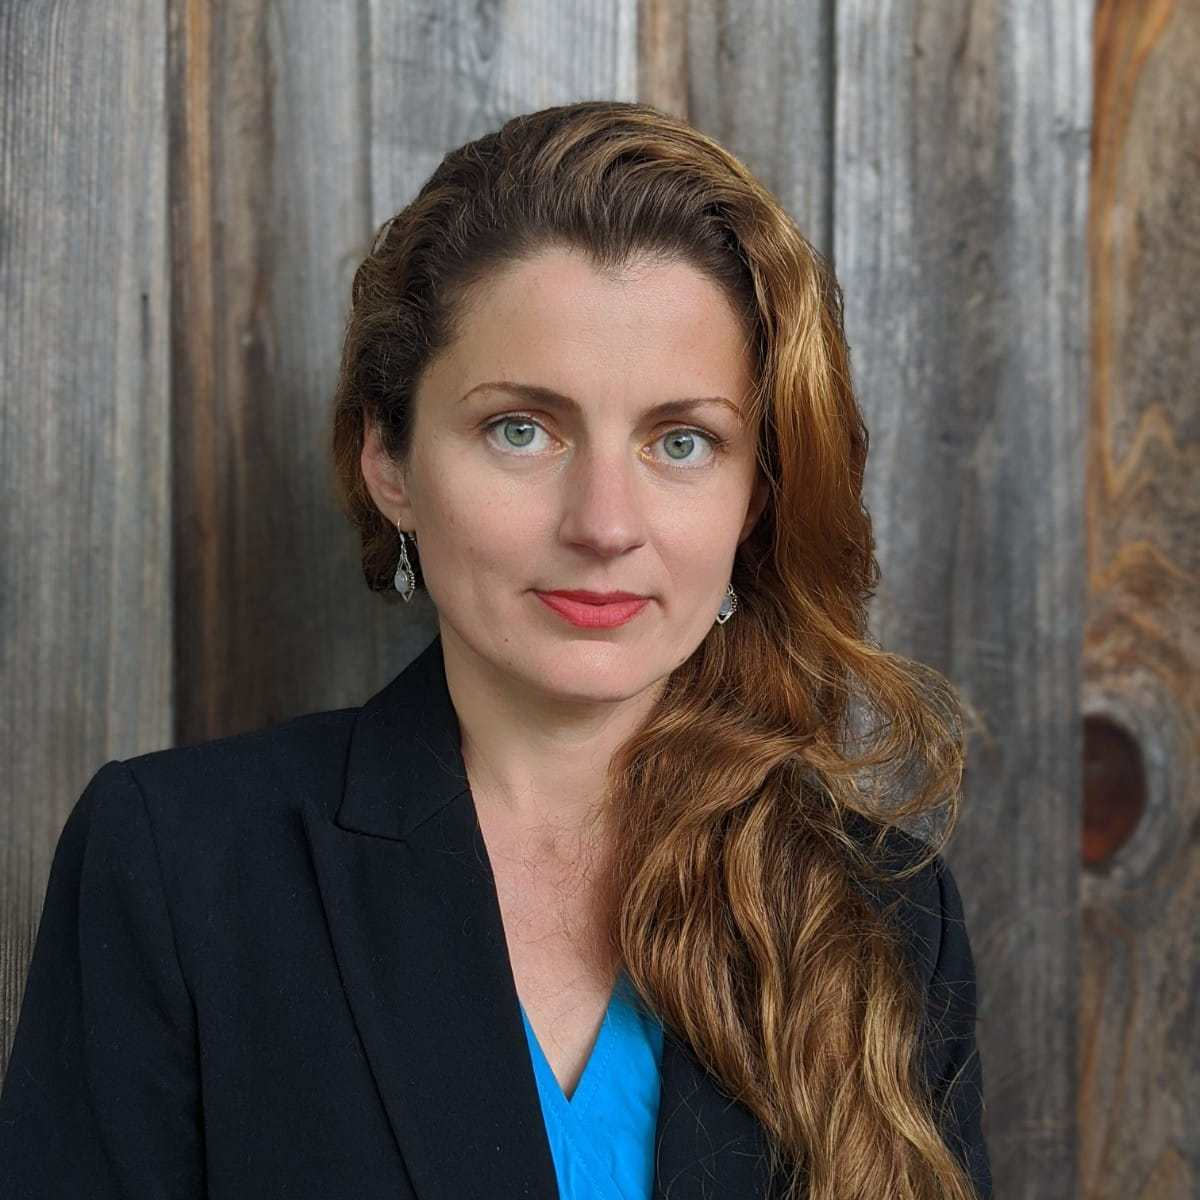 Andreea Gorbatai, UC Berkeley Haas School of Business